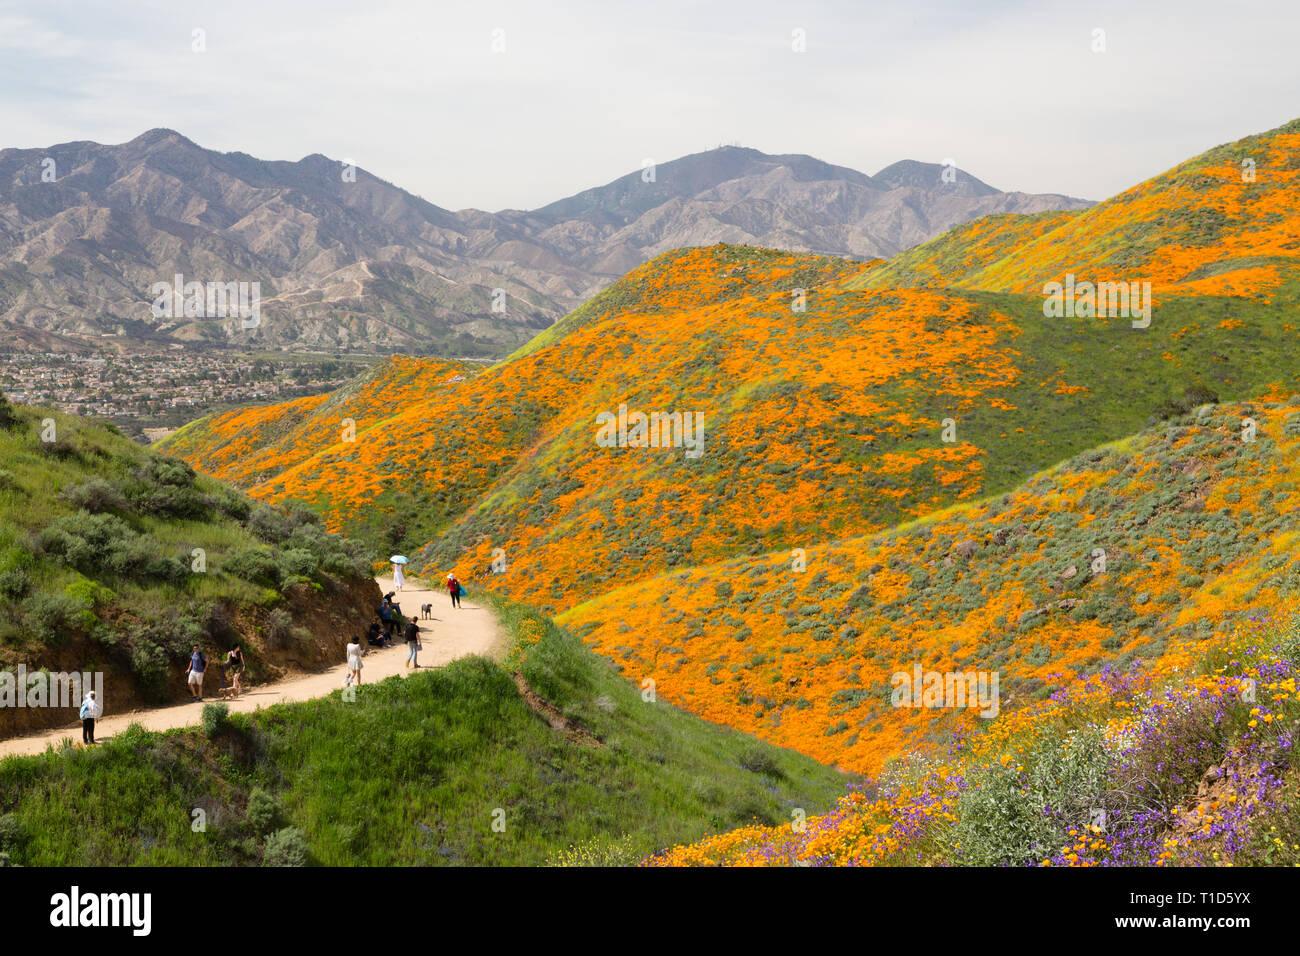 Trail through wildflower superbloom - Stock Image